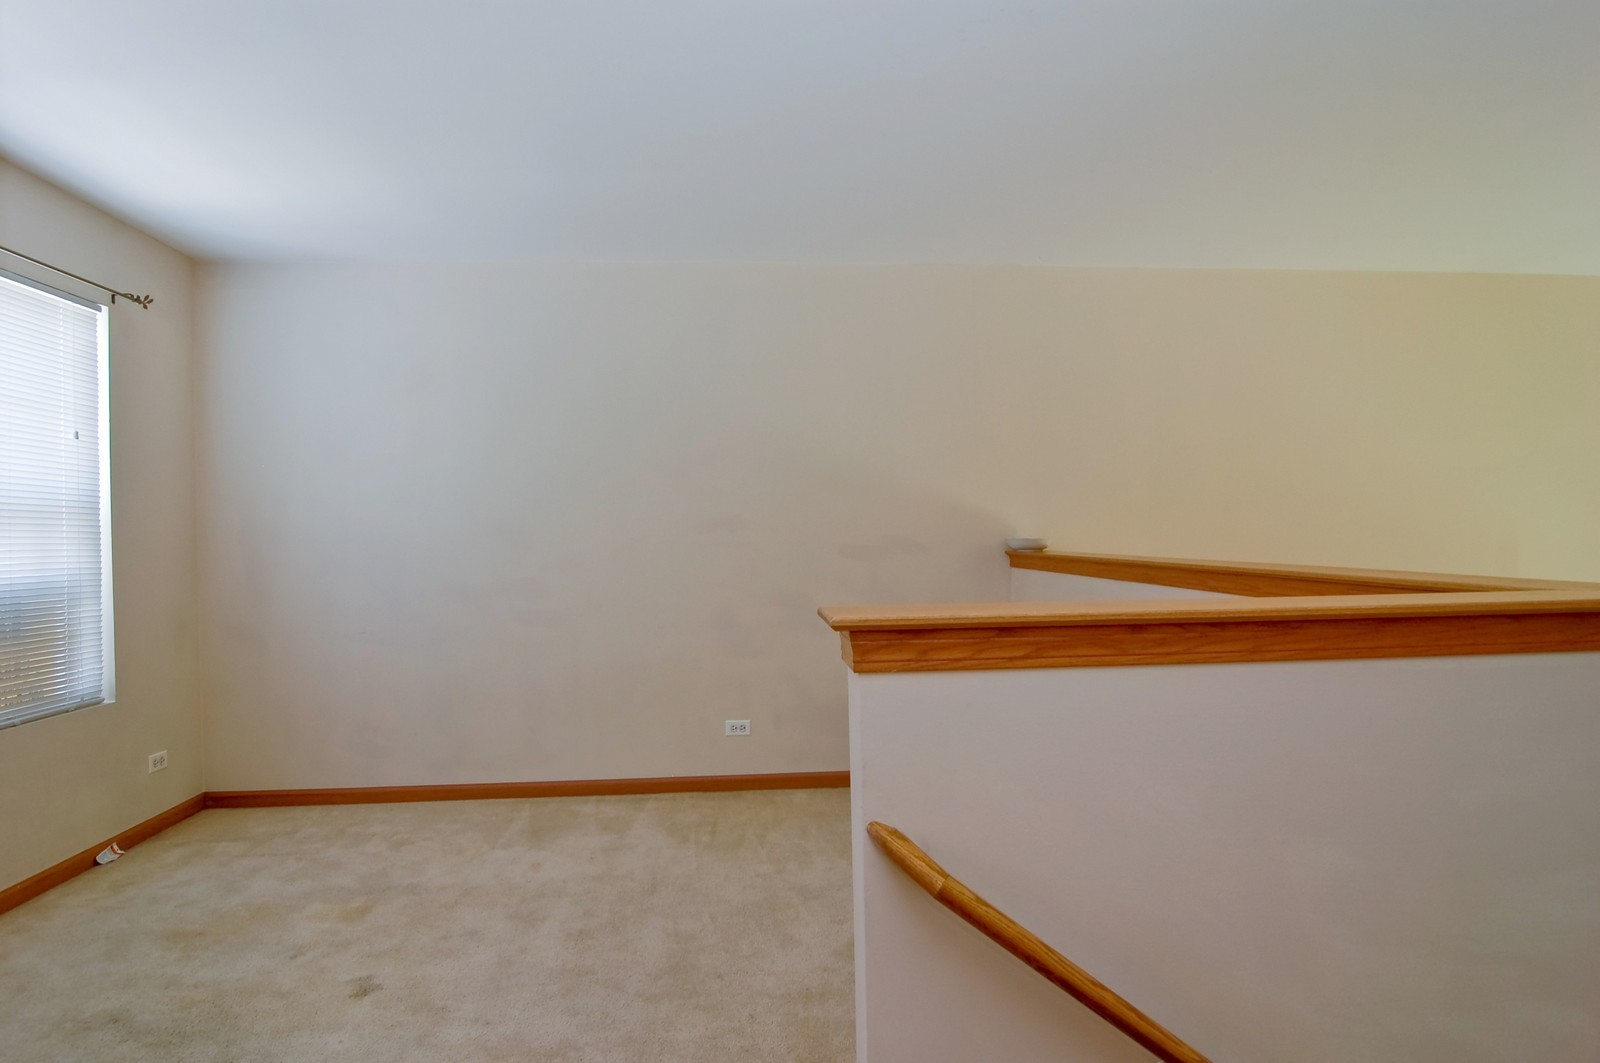 Real Estate Photography - 918 Jacob, West Chicago, IL, 60185 - Loft